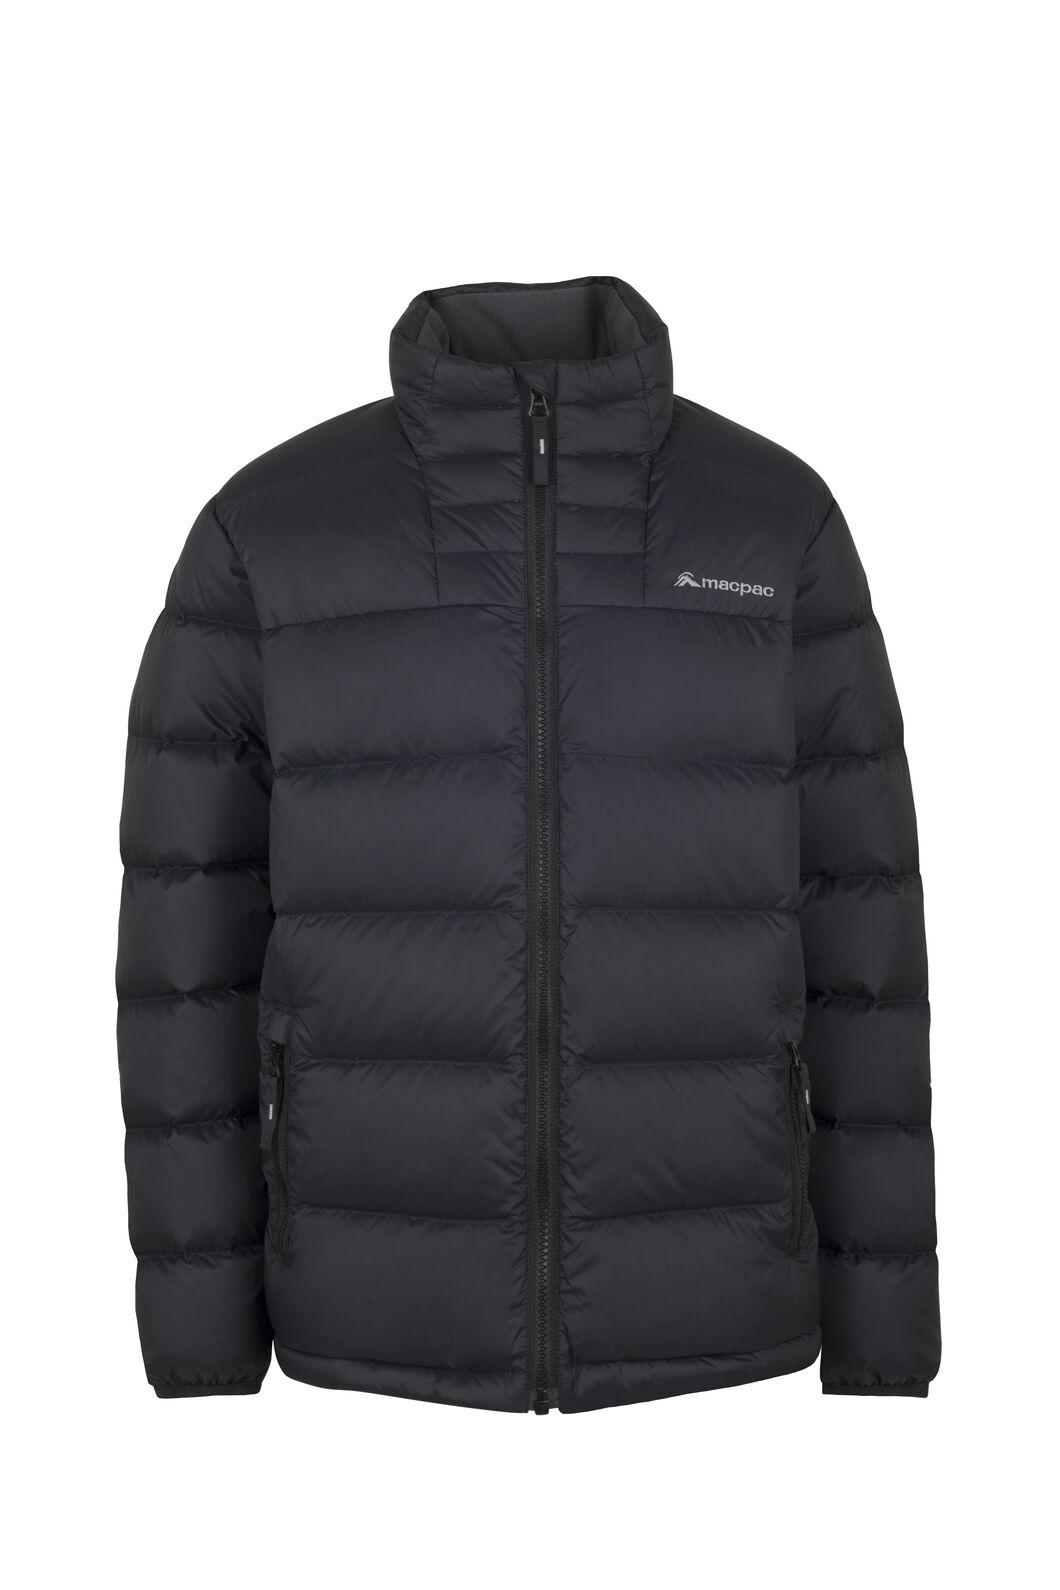 Macpac Atom Down Jacket — Kids', Black, hi-res